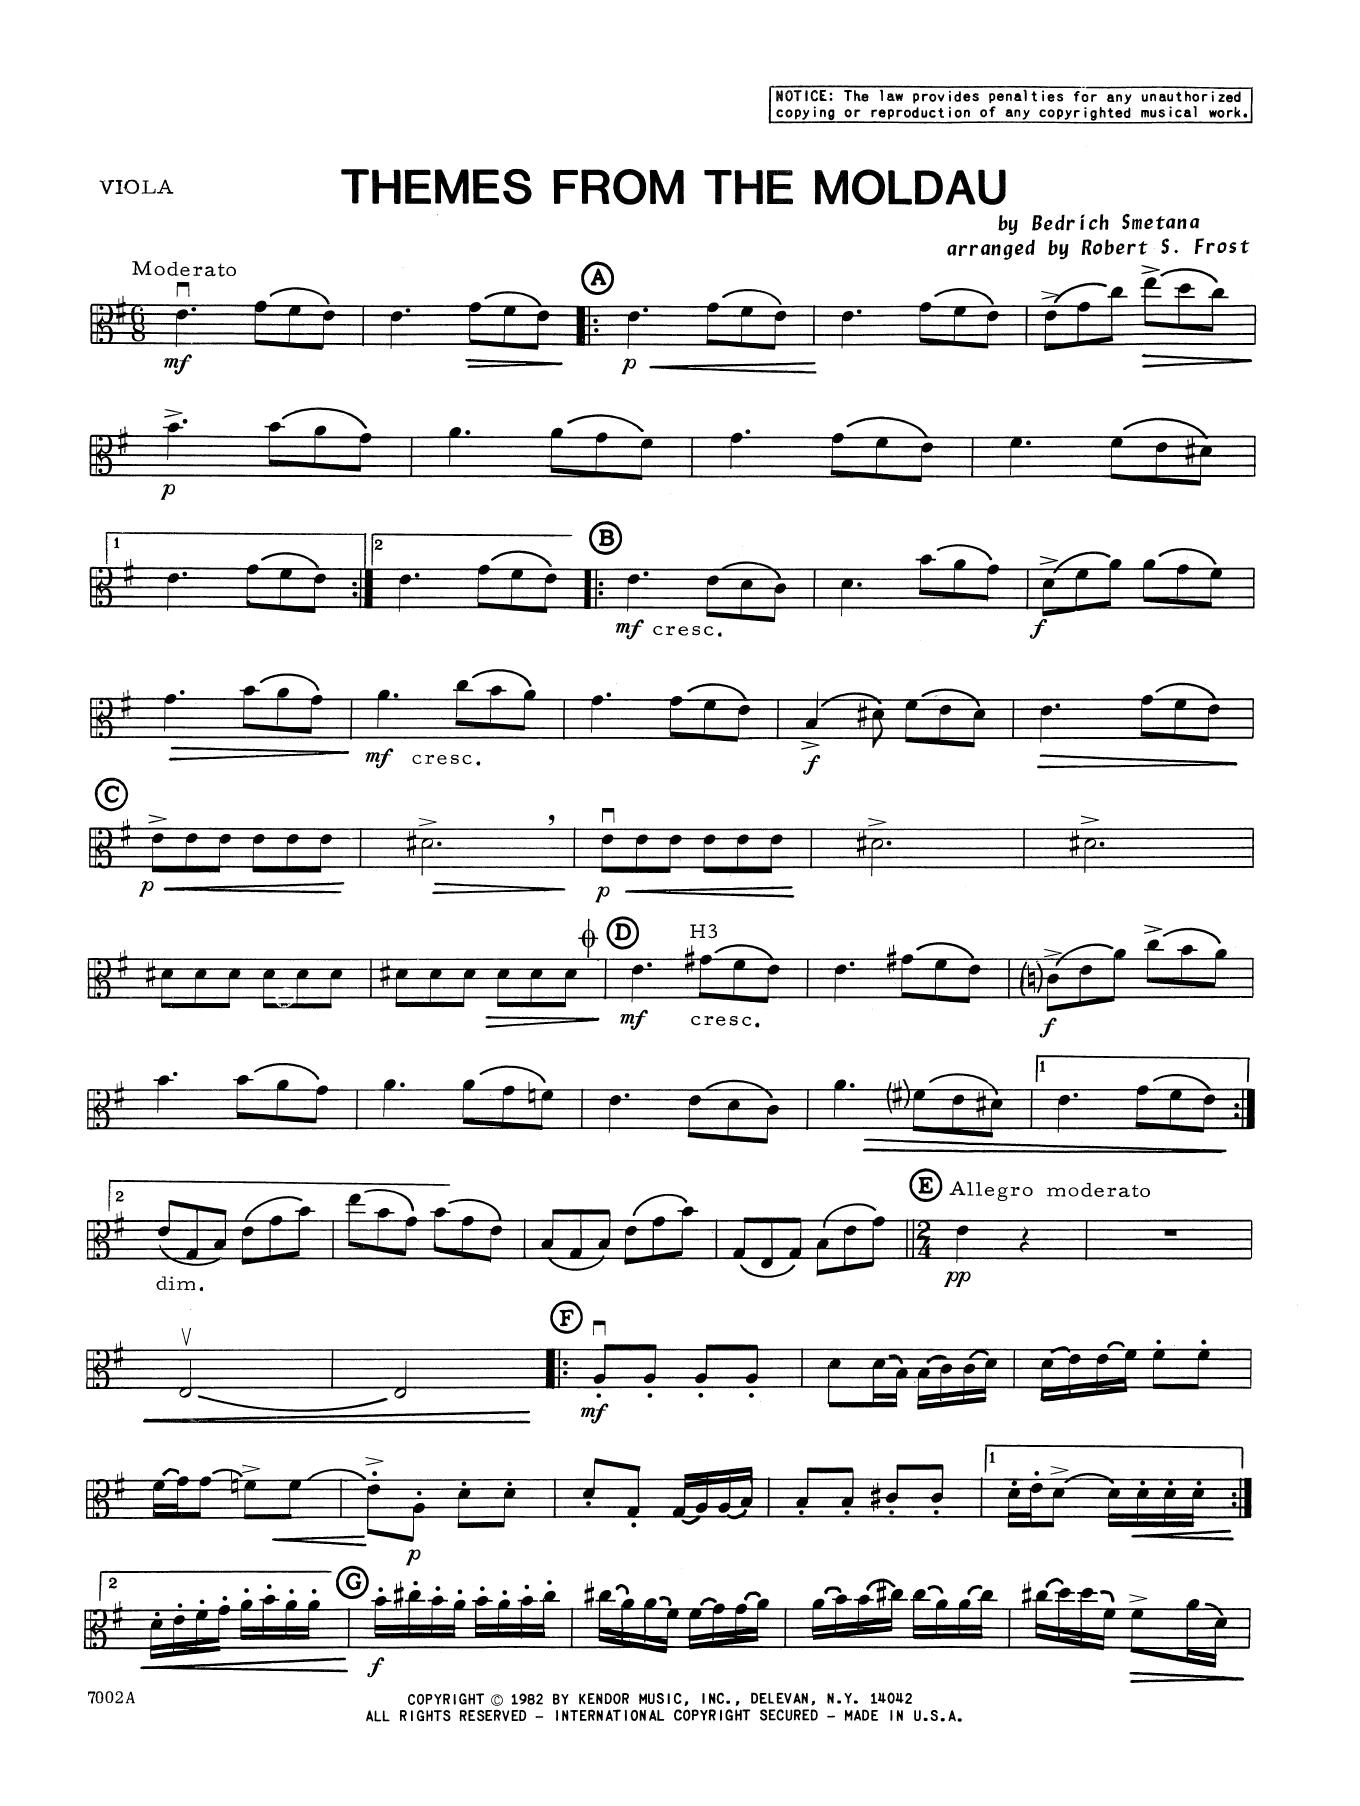 Smetana - Themes From The Moldau - Viola